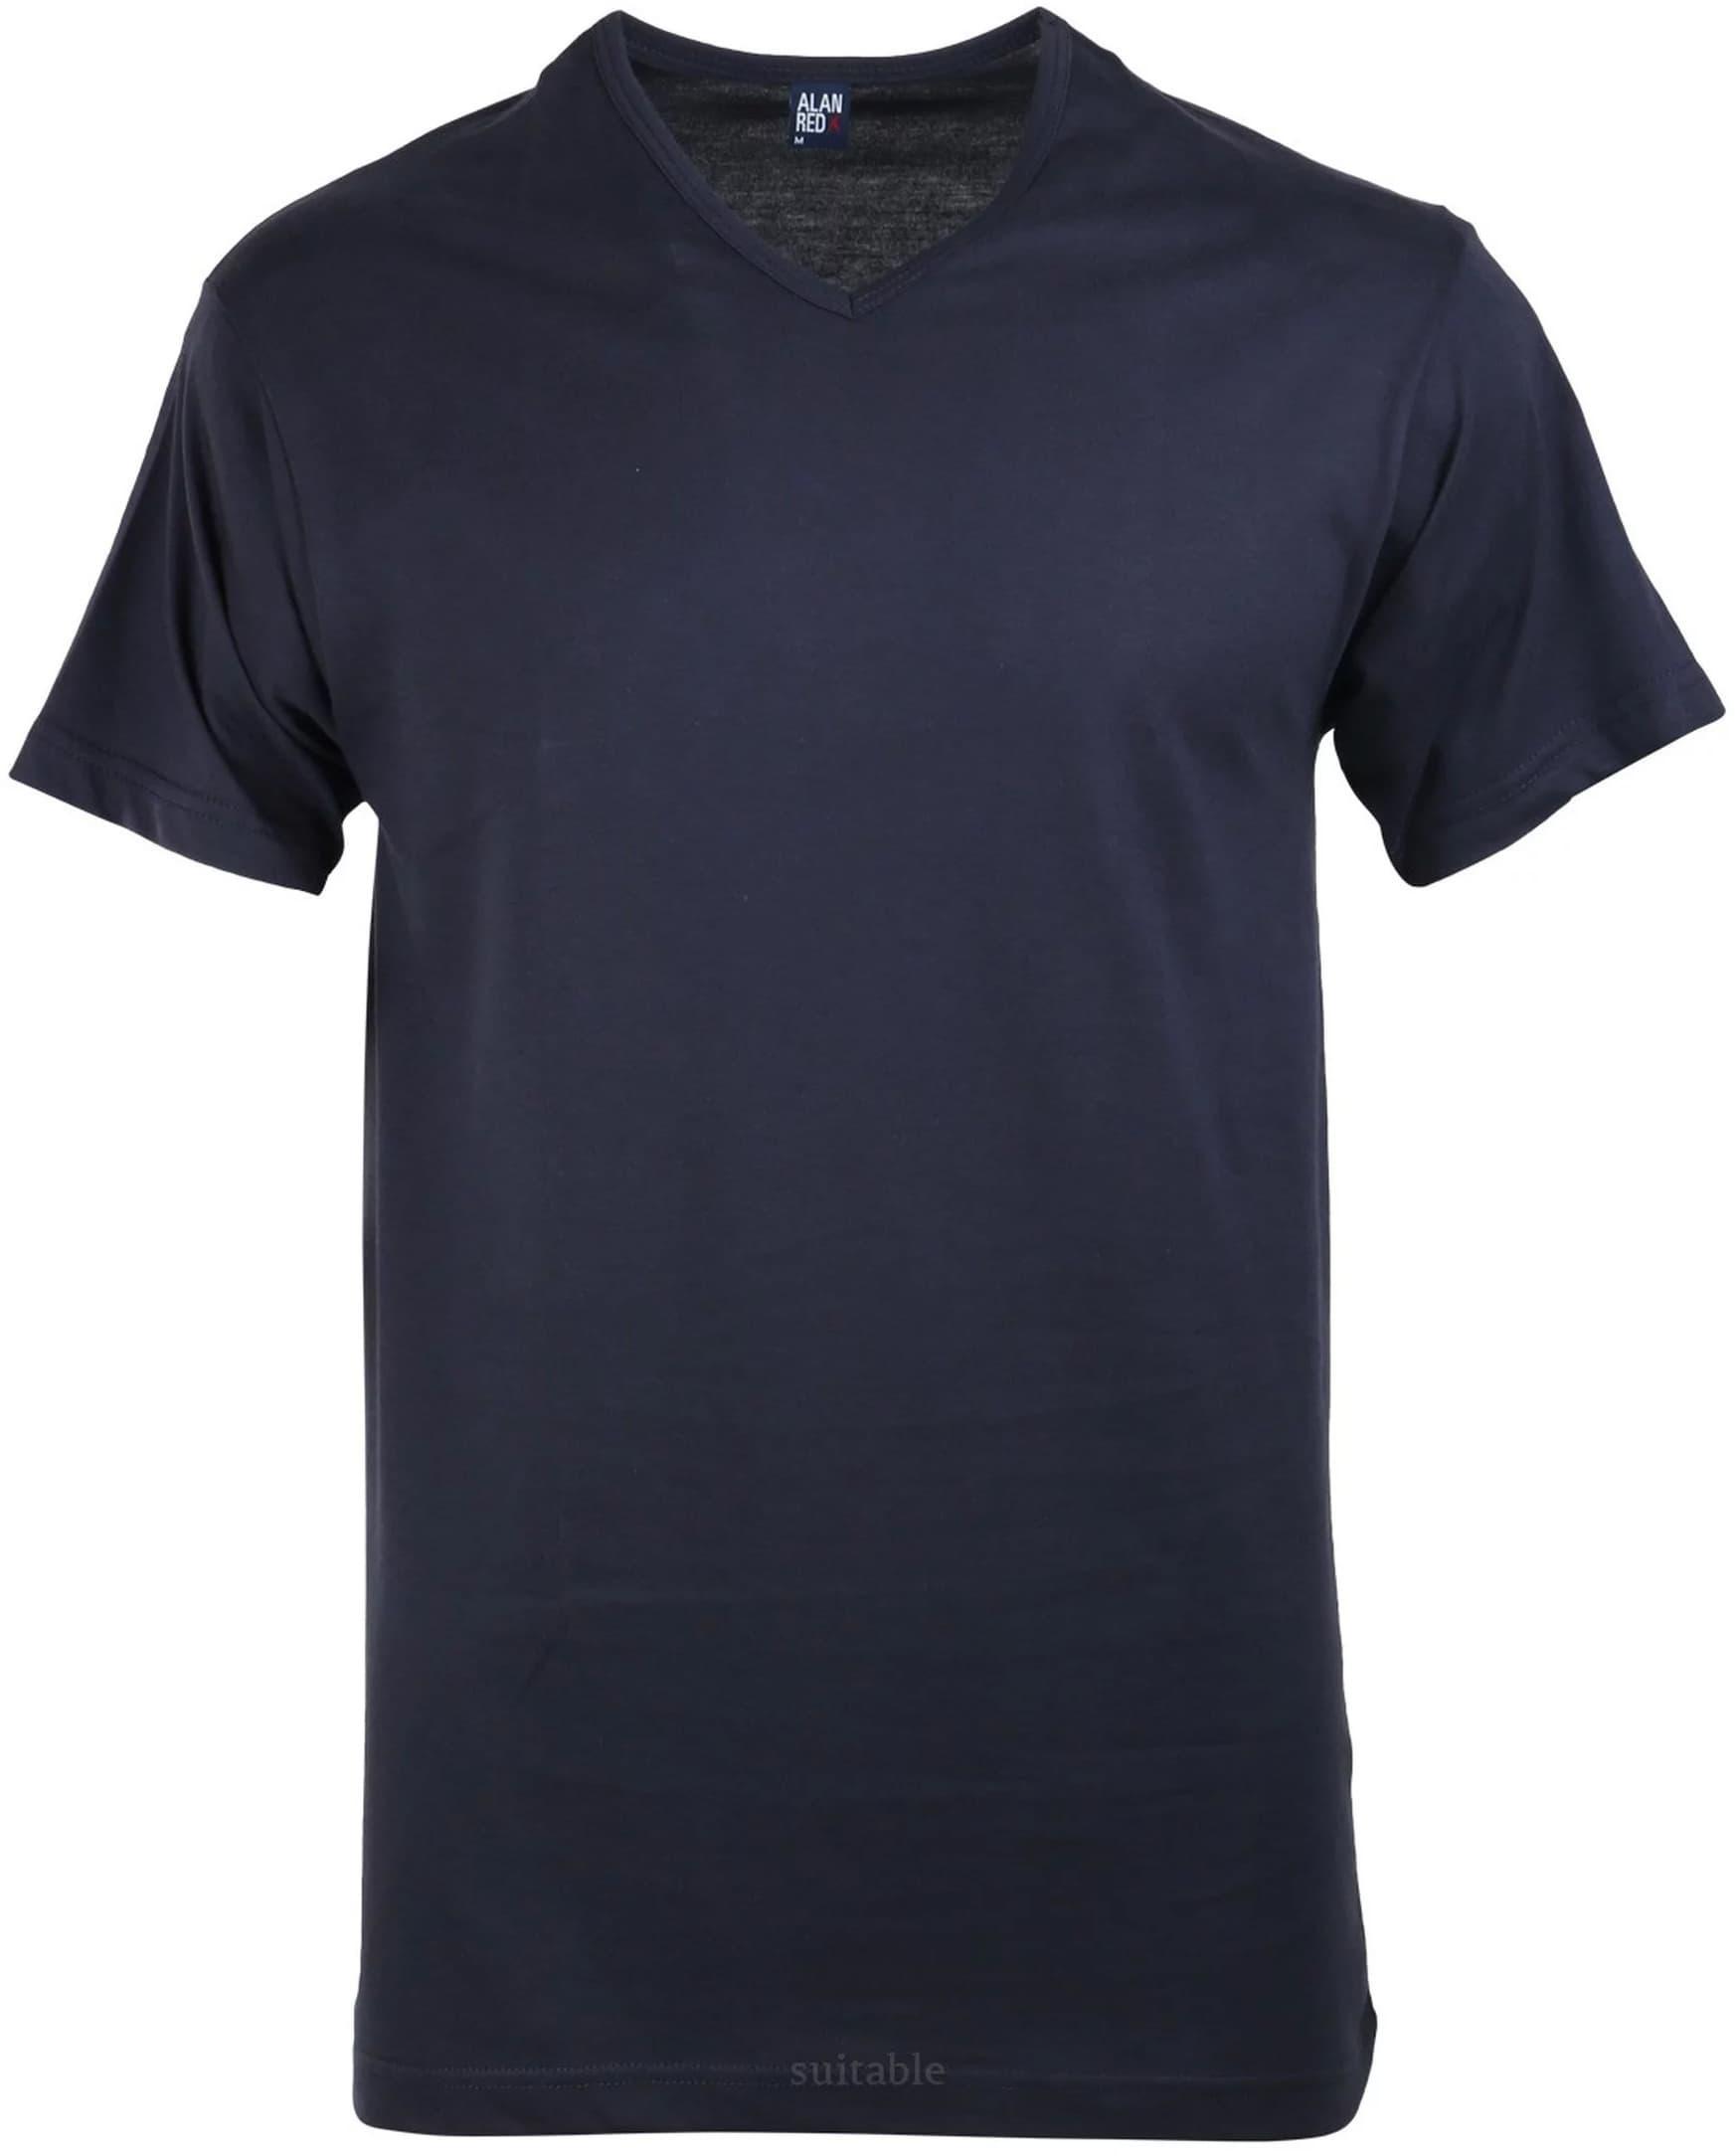 Alan Red Vermont T-shirt V-Neck Navy 1-Pack foto 0